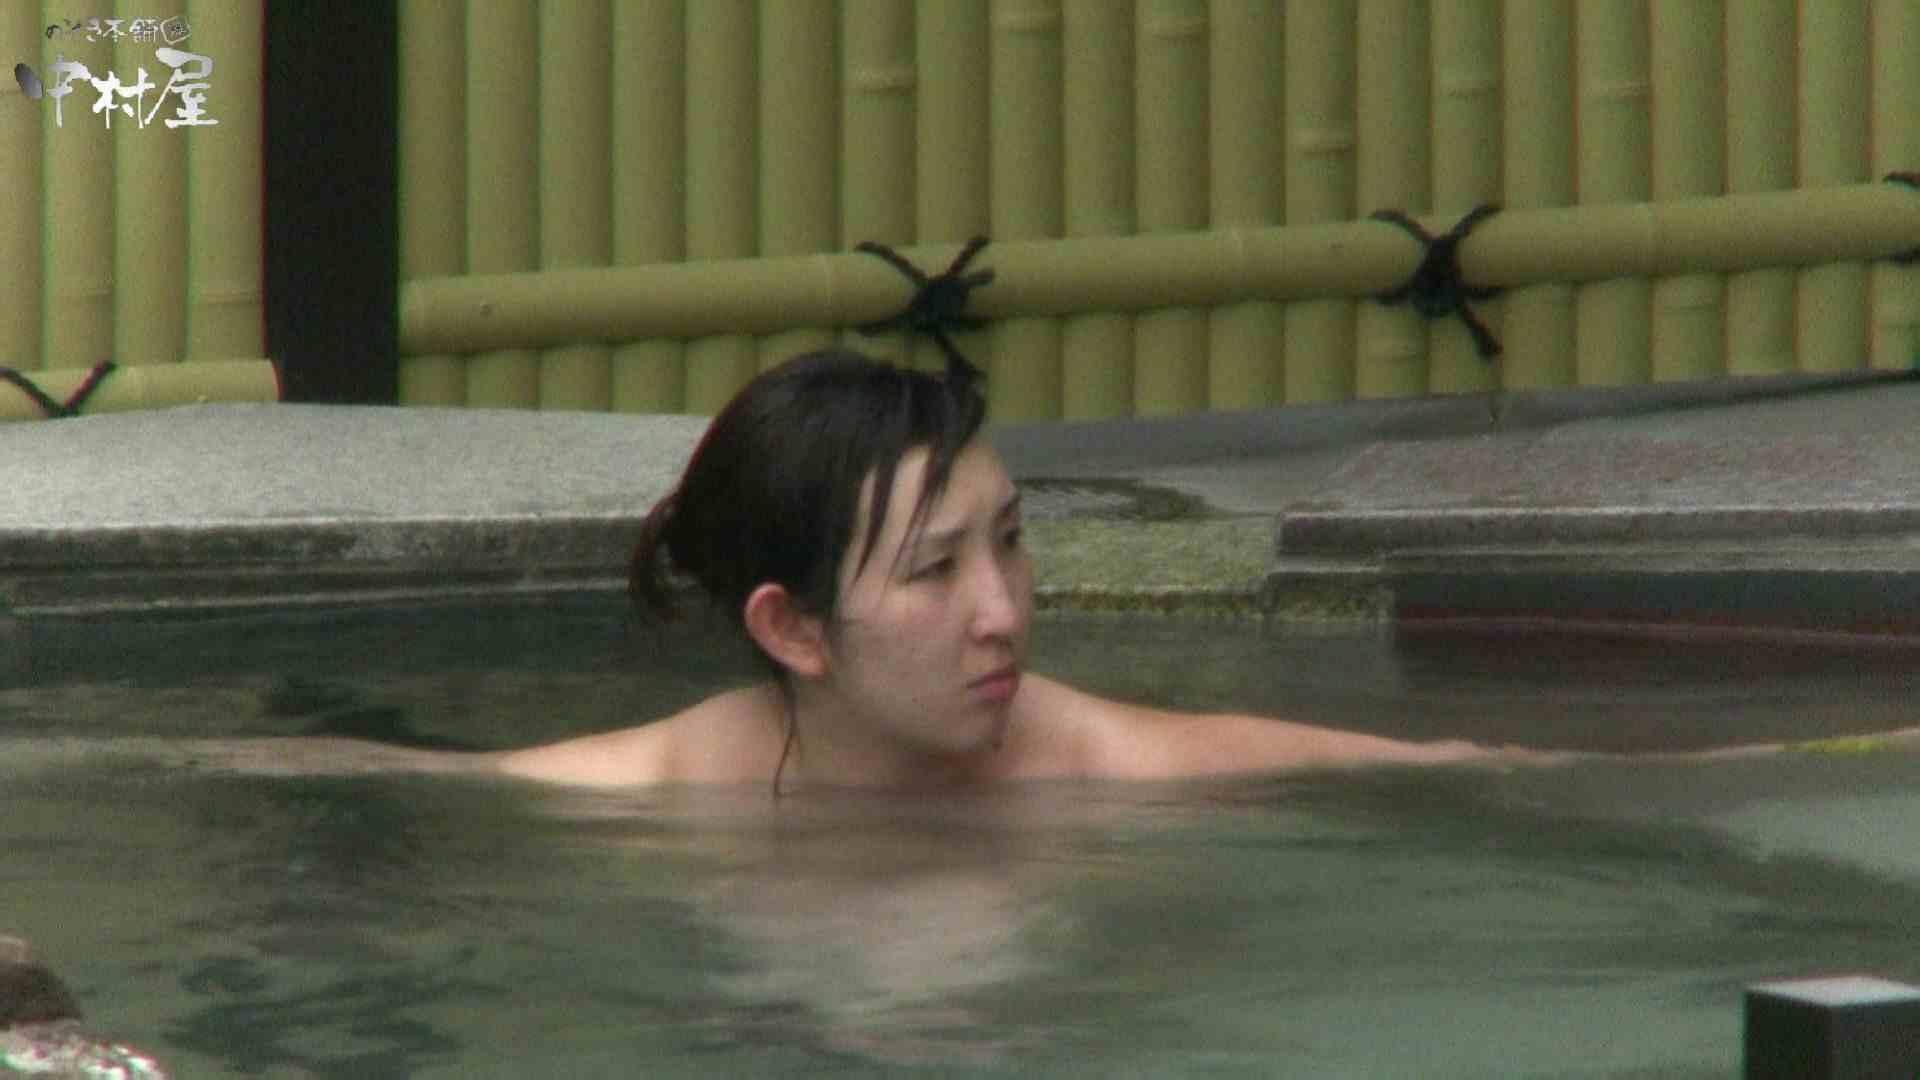 Aquaな露天風呂Vol.948 盗撮   HなOL  78pic 22